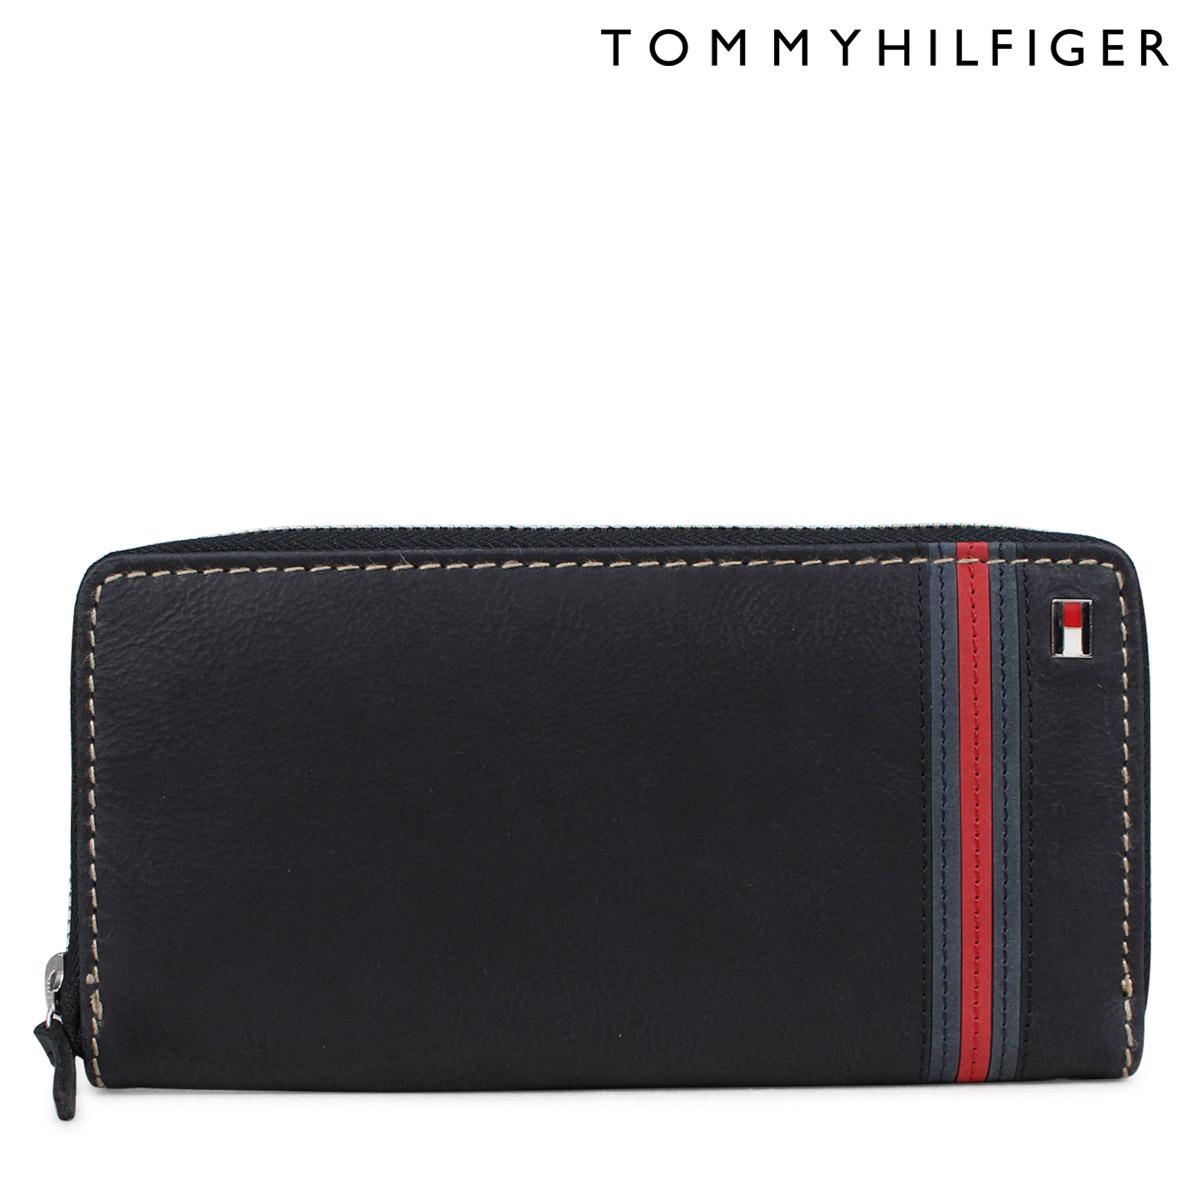 61ce030aee24d Sugar Online Shop  TOMMY HILFIGER wallet トミーヒルフィガー long wallet men round  fastener leather YALE 31TL13X012 91-4811 black  7 5 Shinnyu load  ...